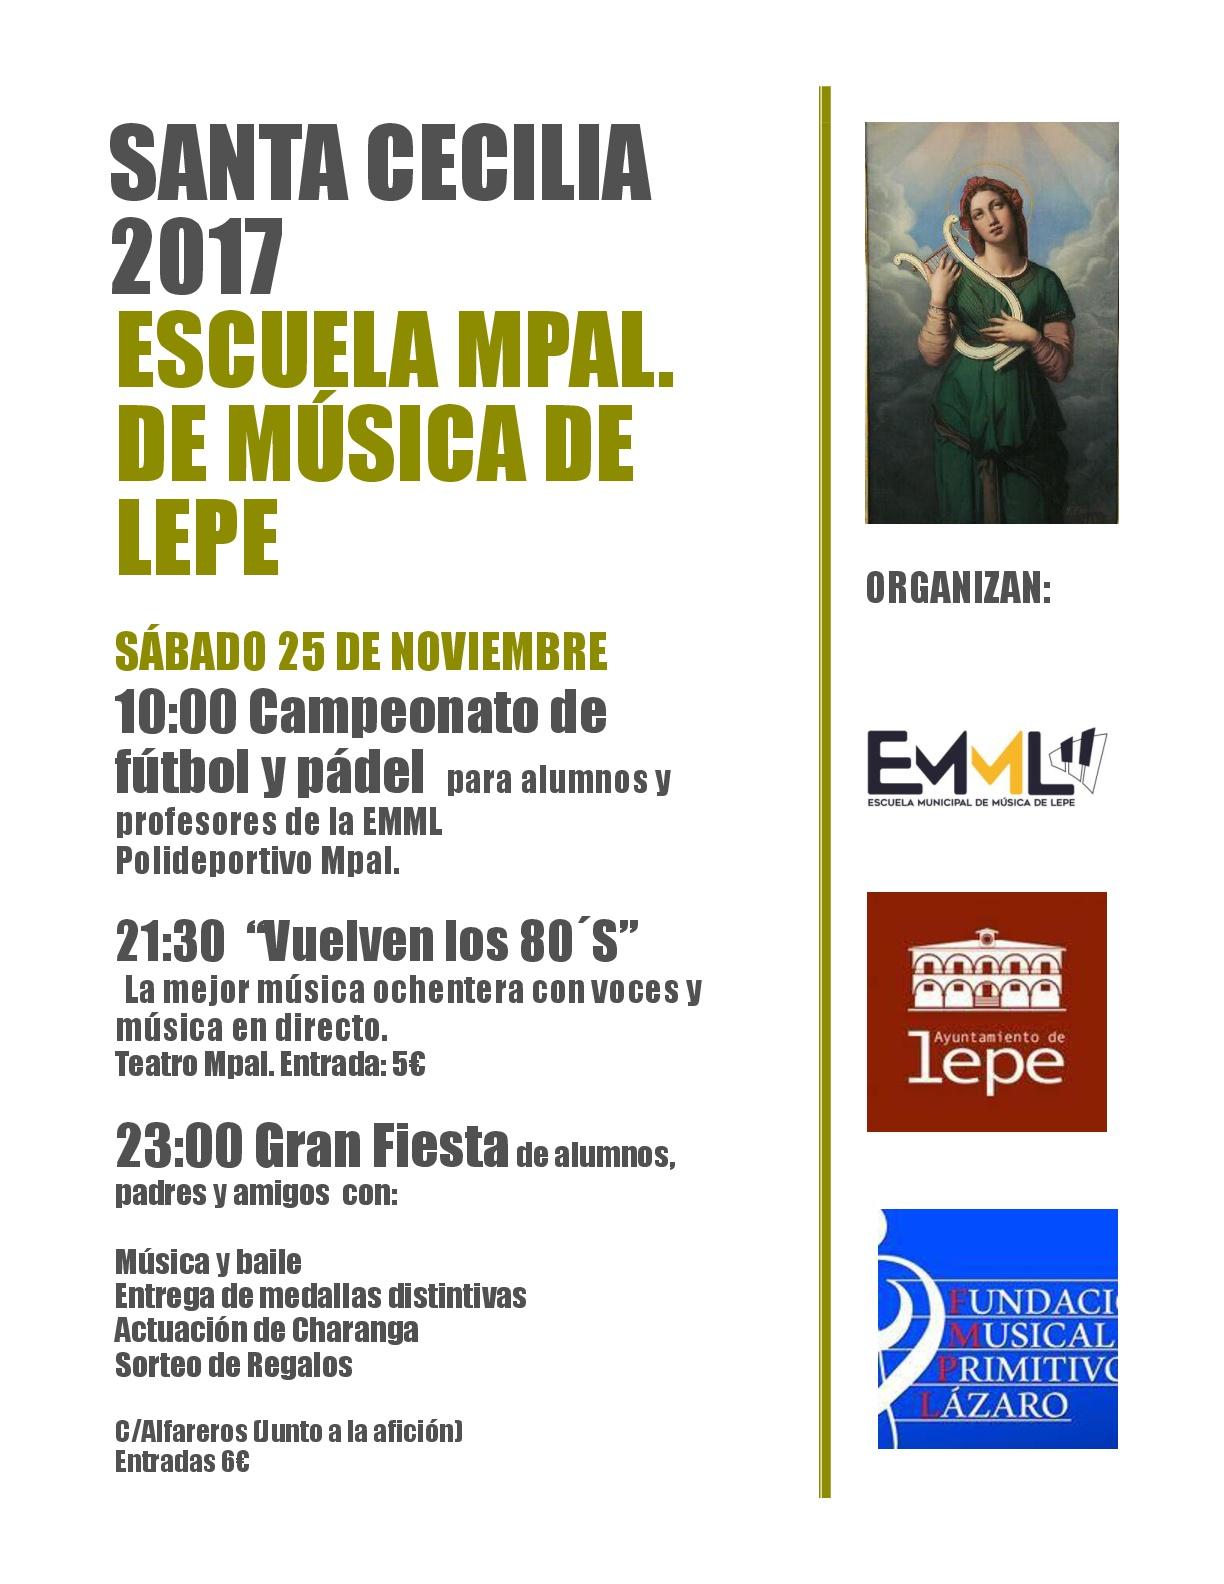 escuela musica lepe santa cecilia 2017